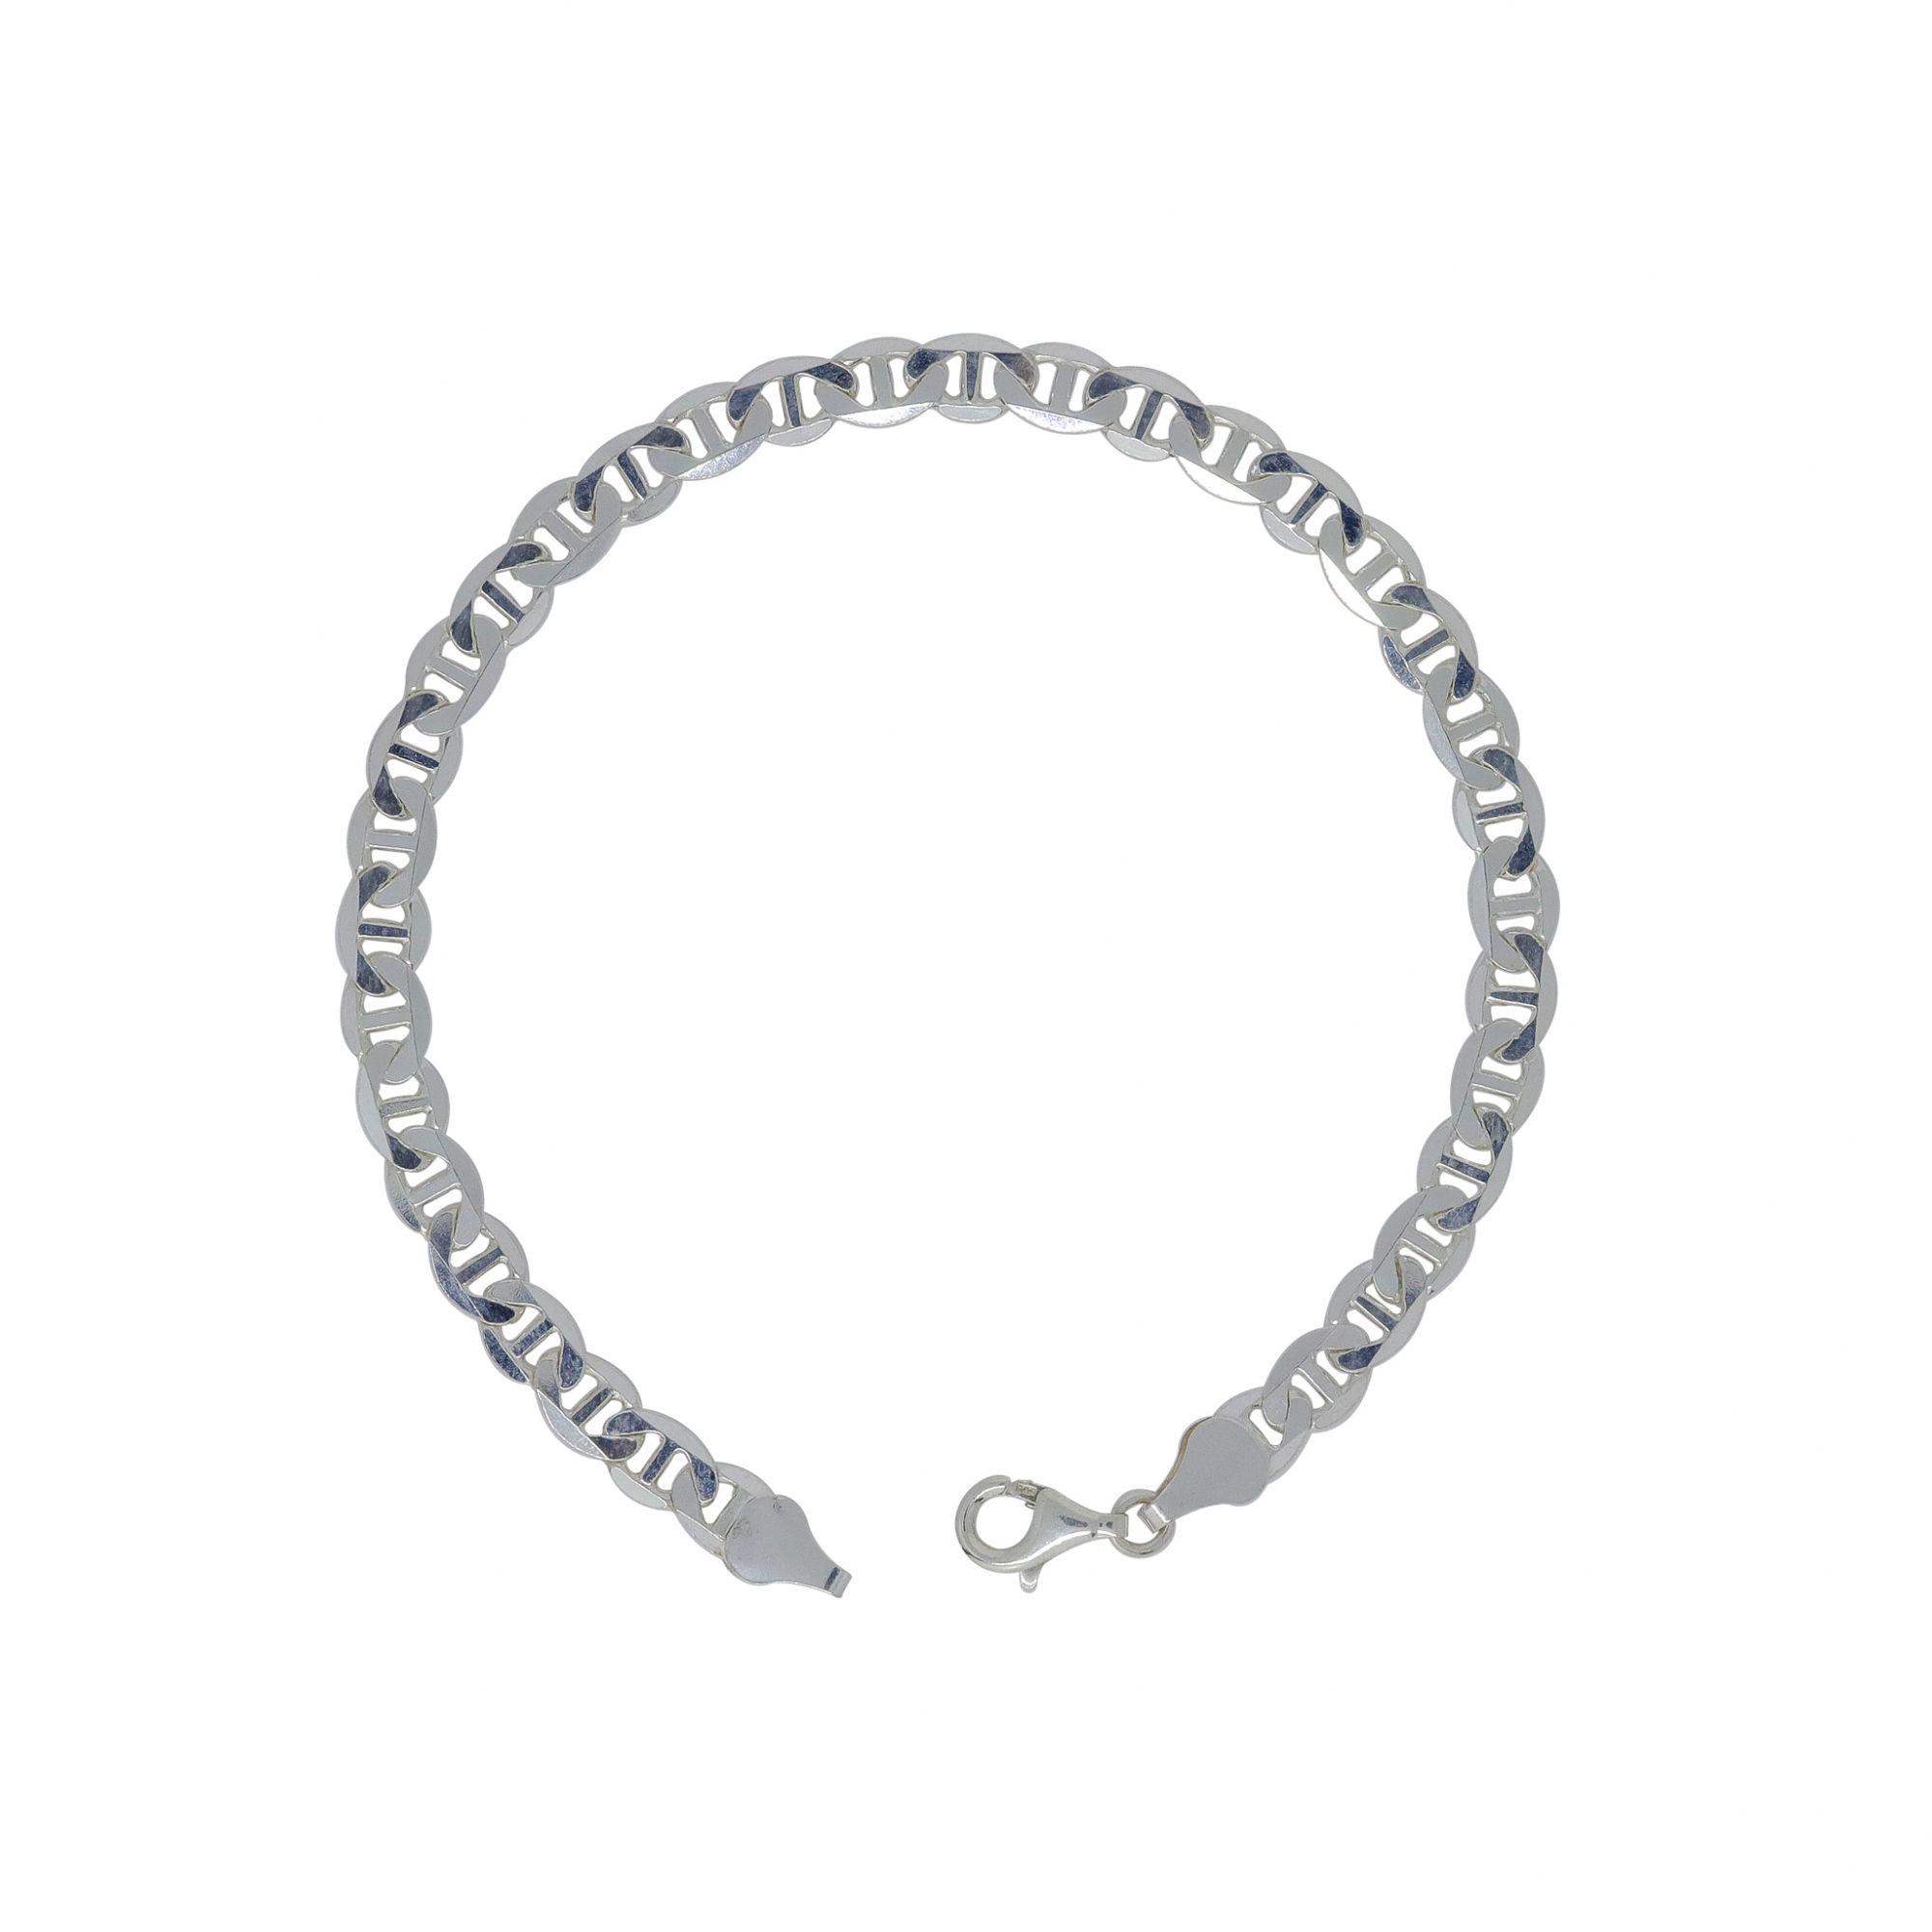 Pulseira prata 925 piastrine